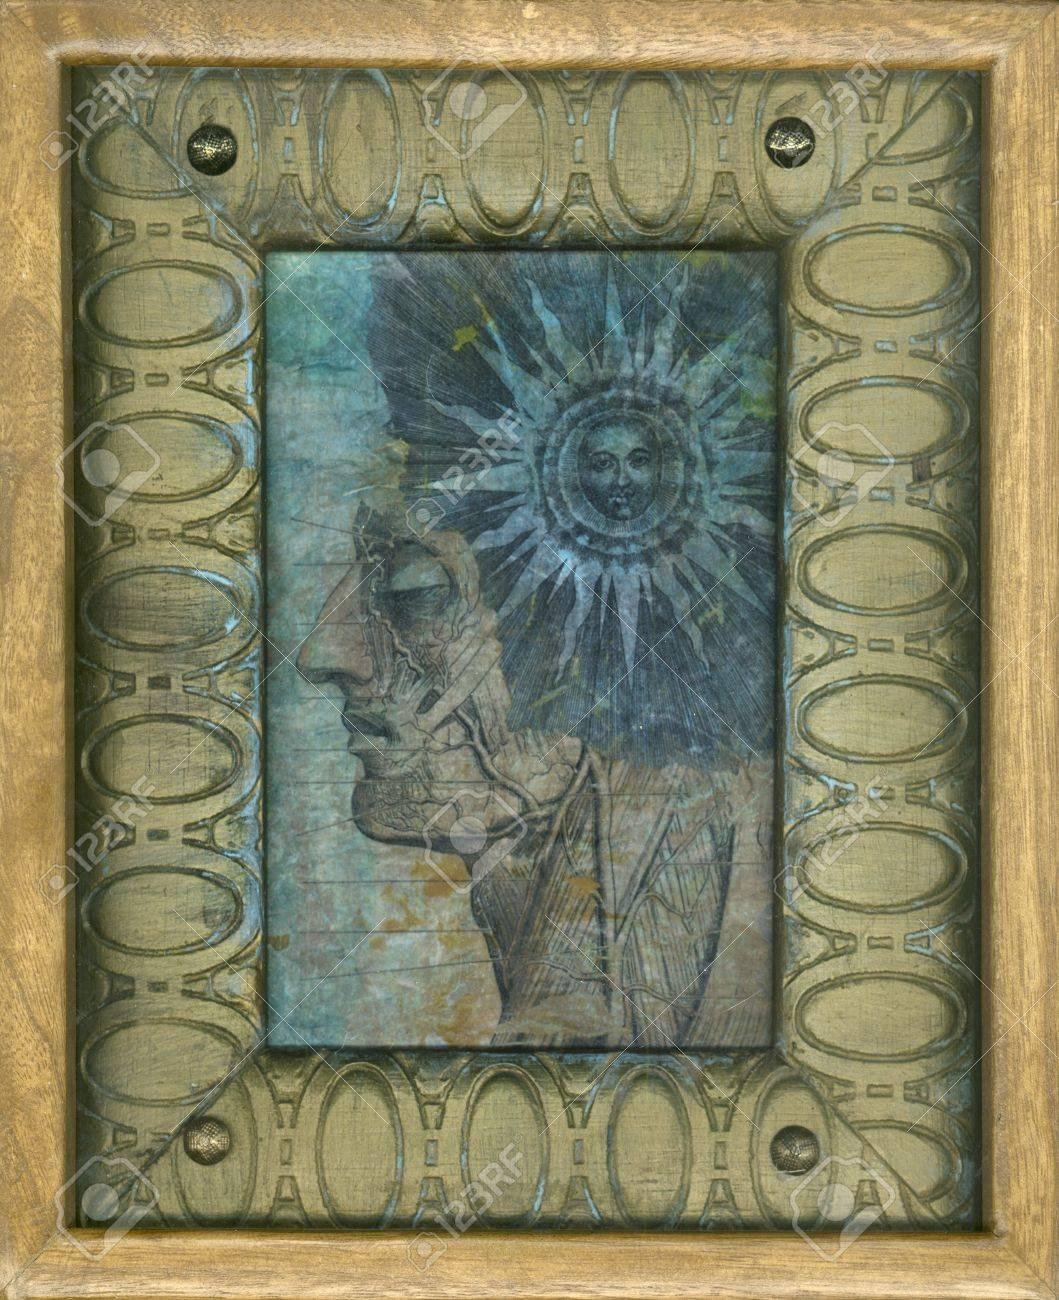 Ancient sun and anatomy gel medium transfers on kinwashi, in wood frames - 15512576